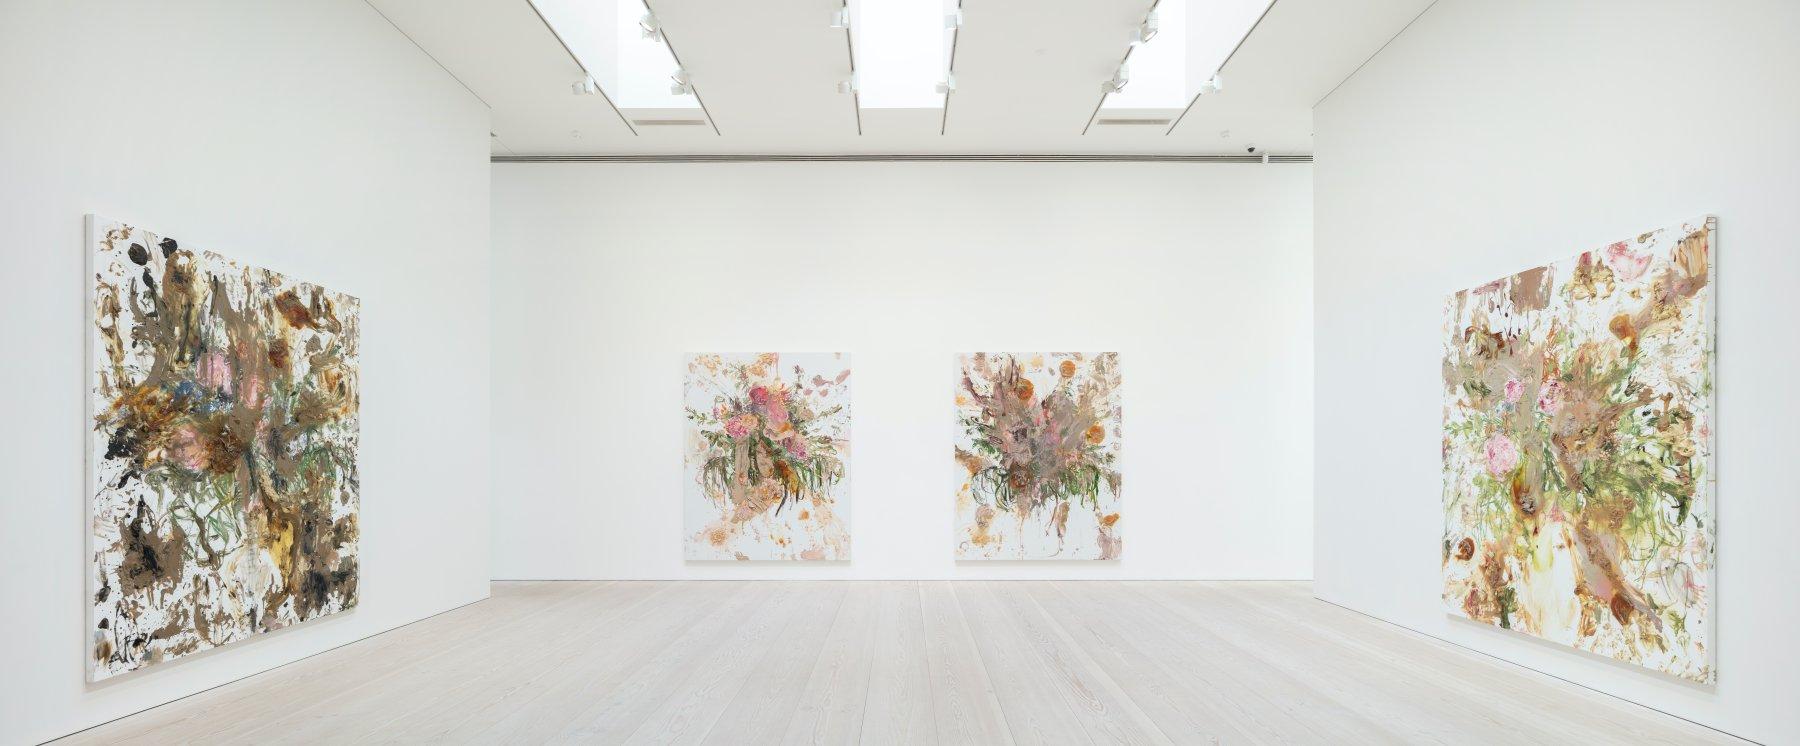 Galerie Forsblom Heikki Marila 1